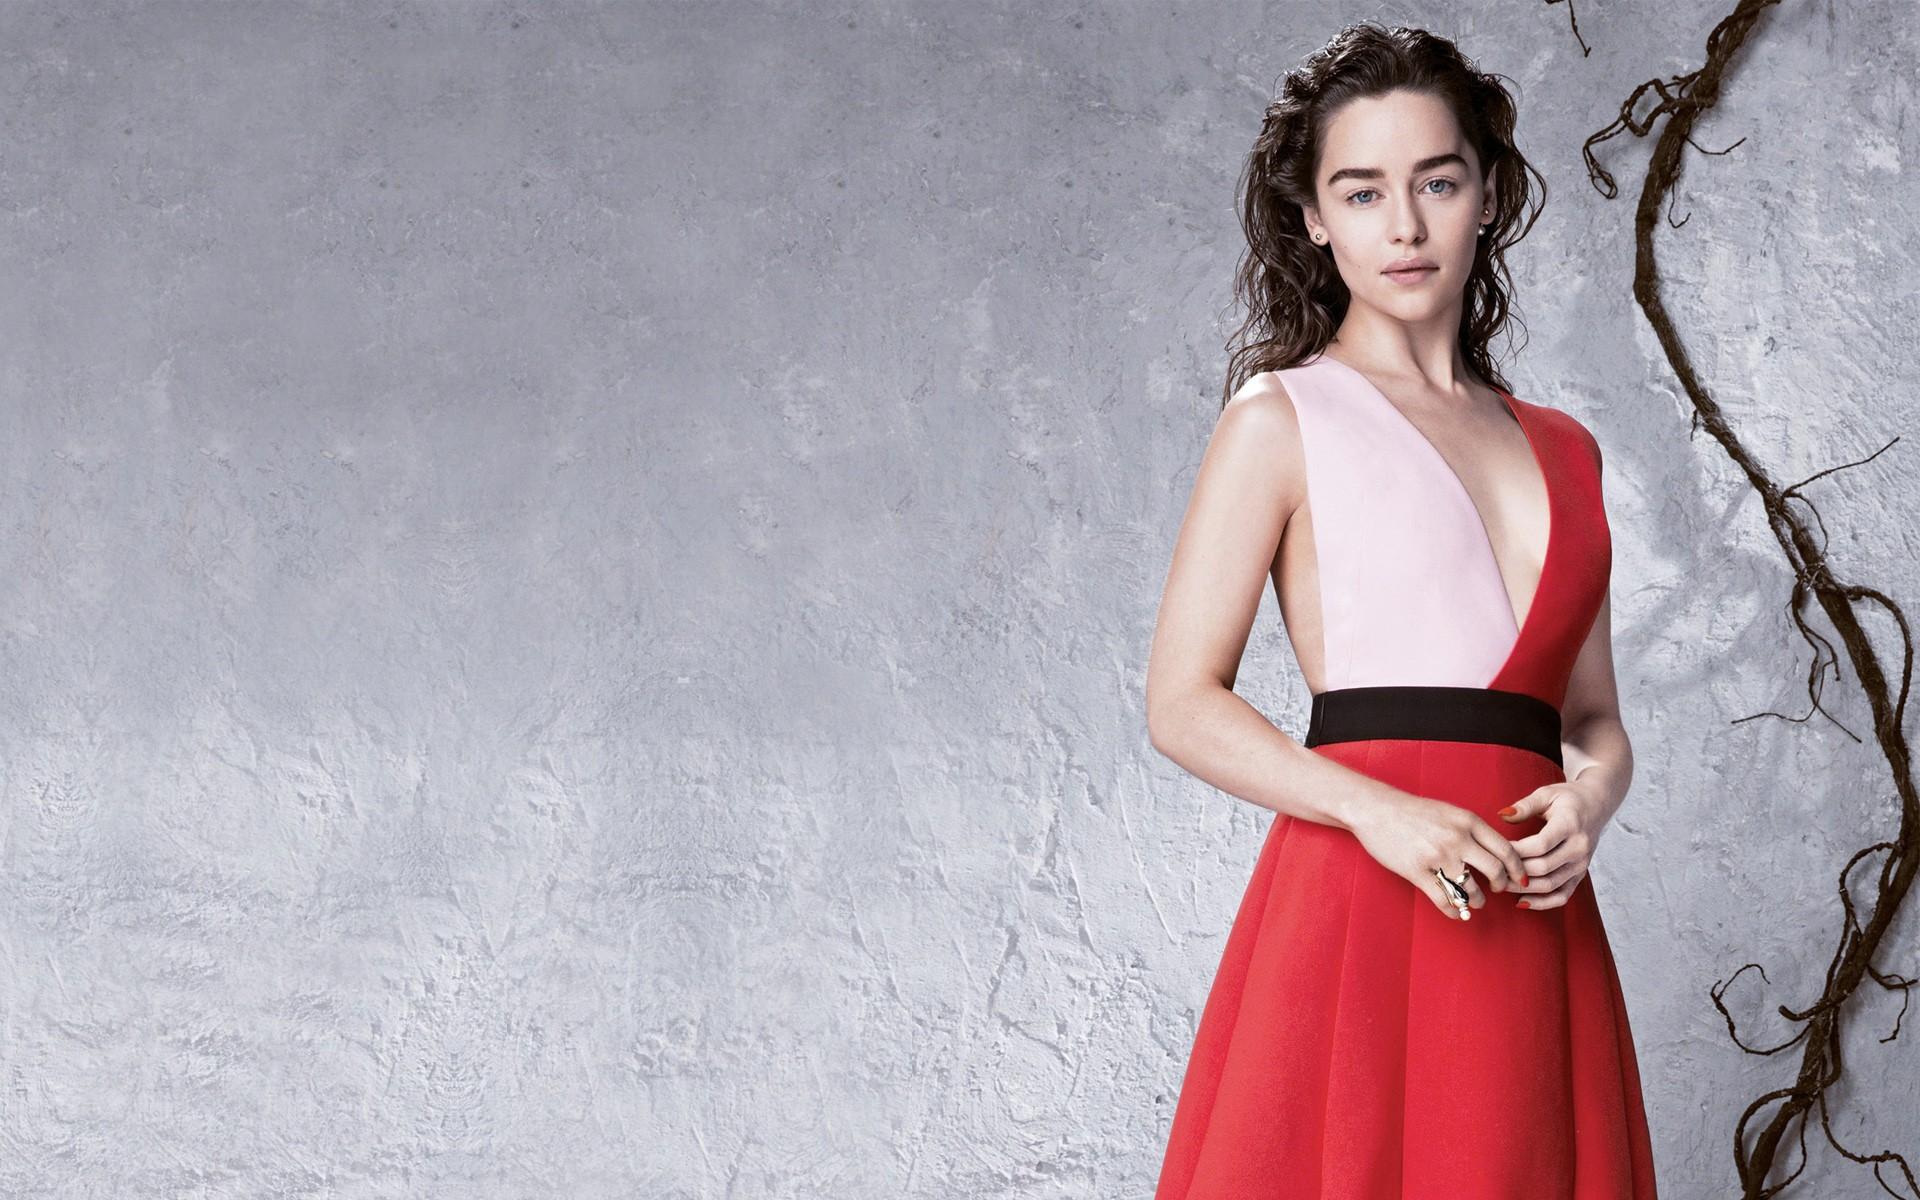 Emilia Clarke Wallpapers (+38